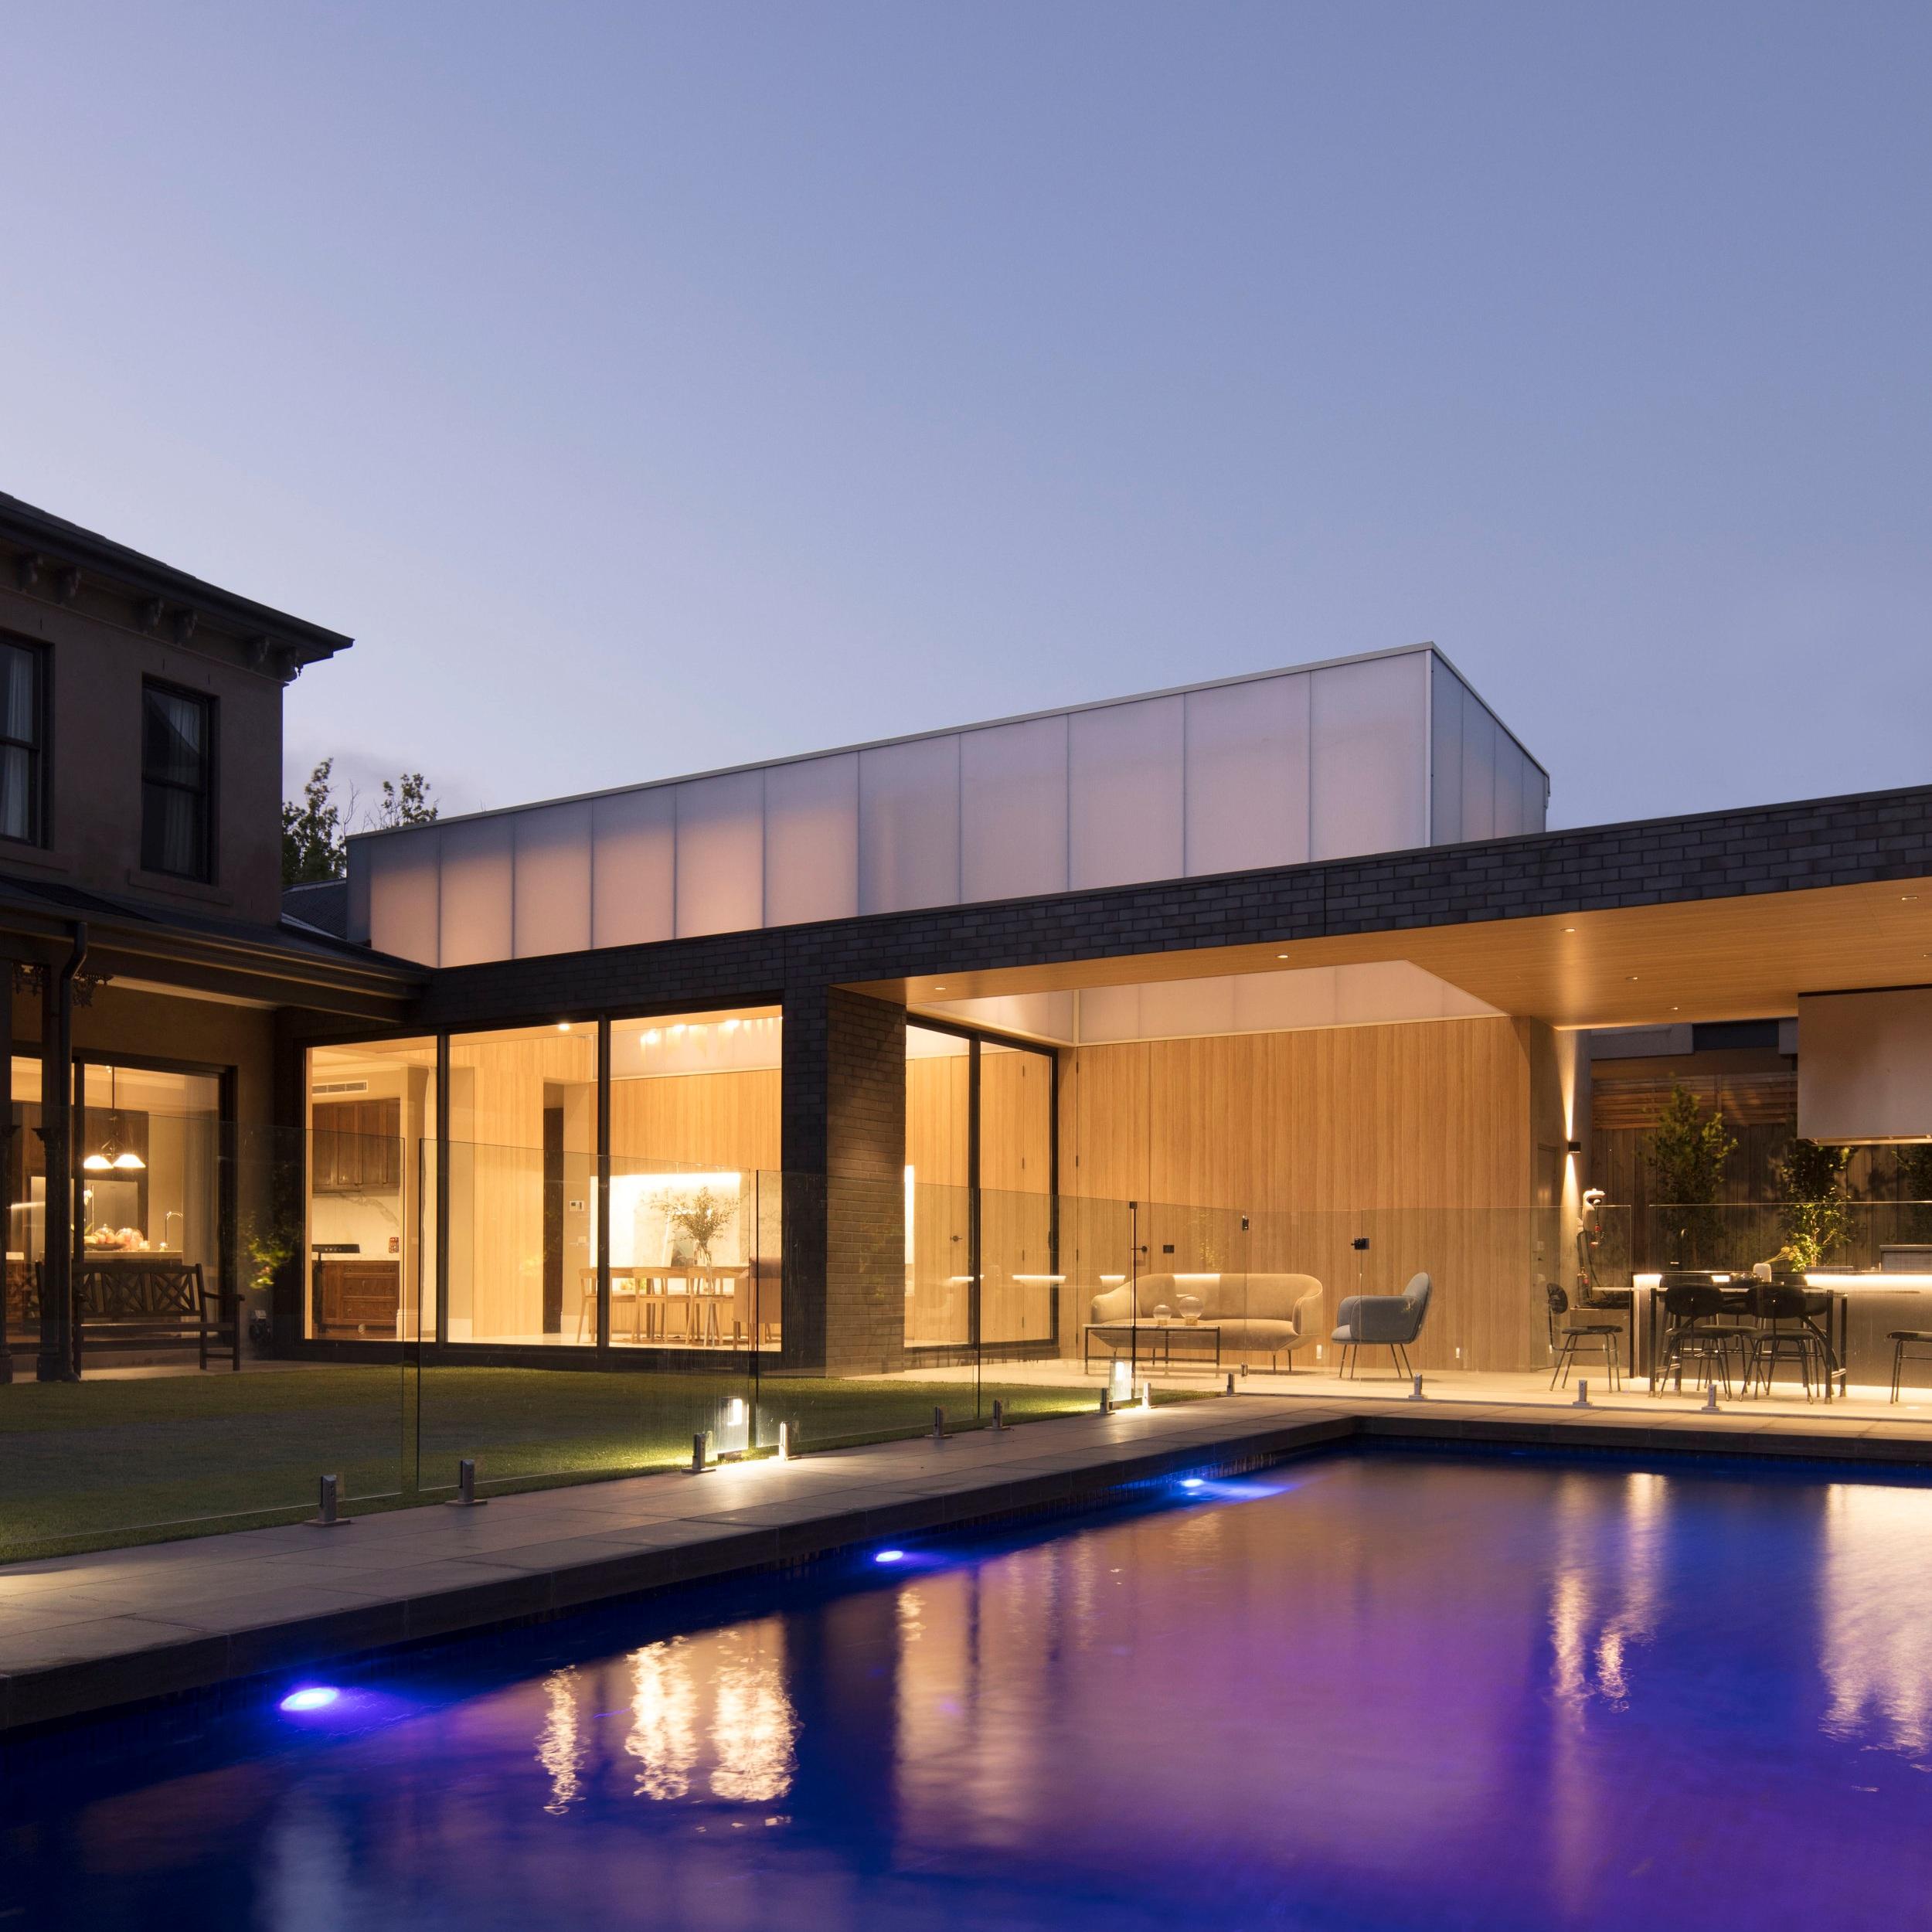 Pitch_Architecture_Lantern House_1